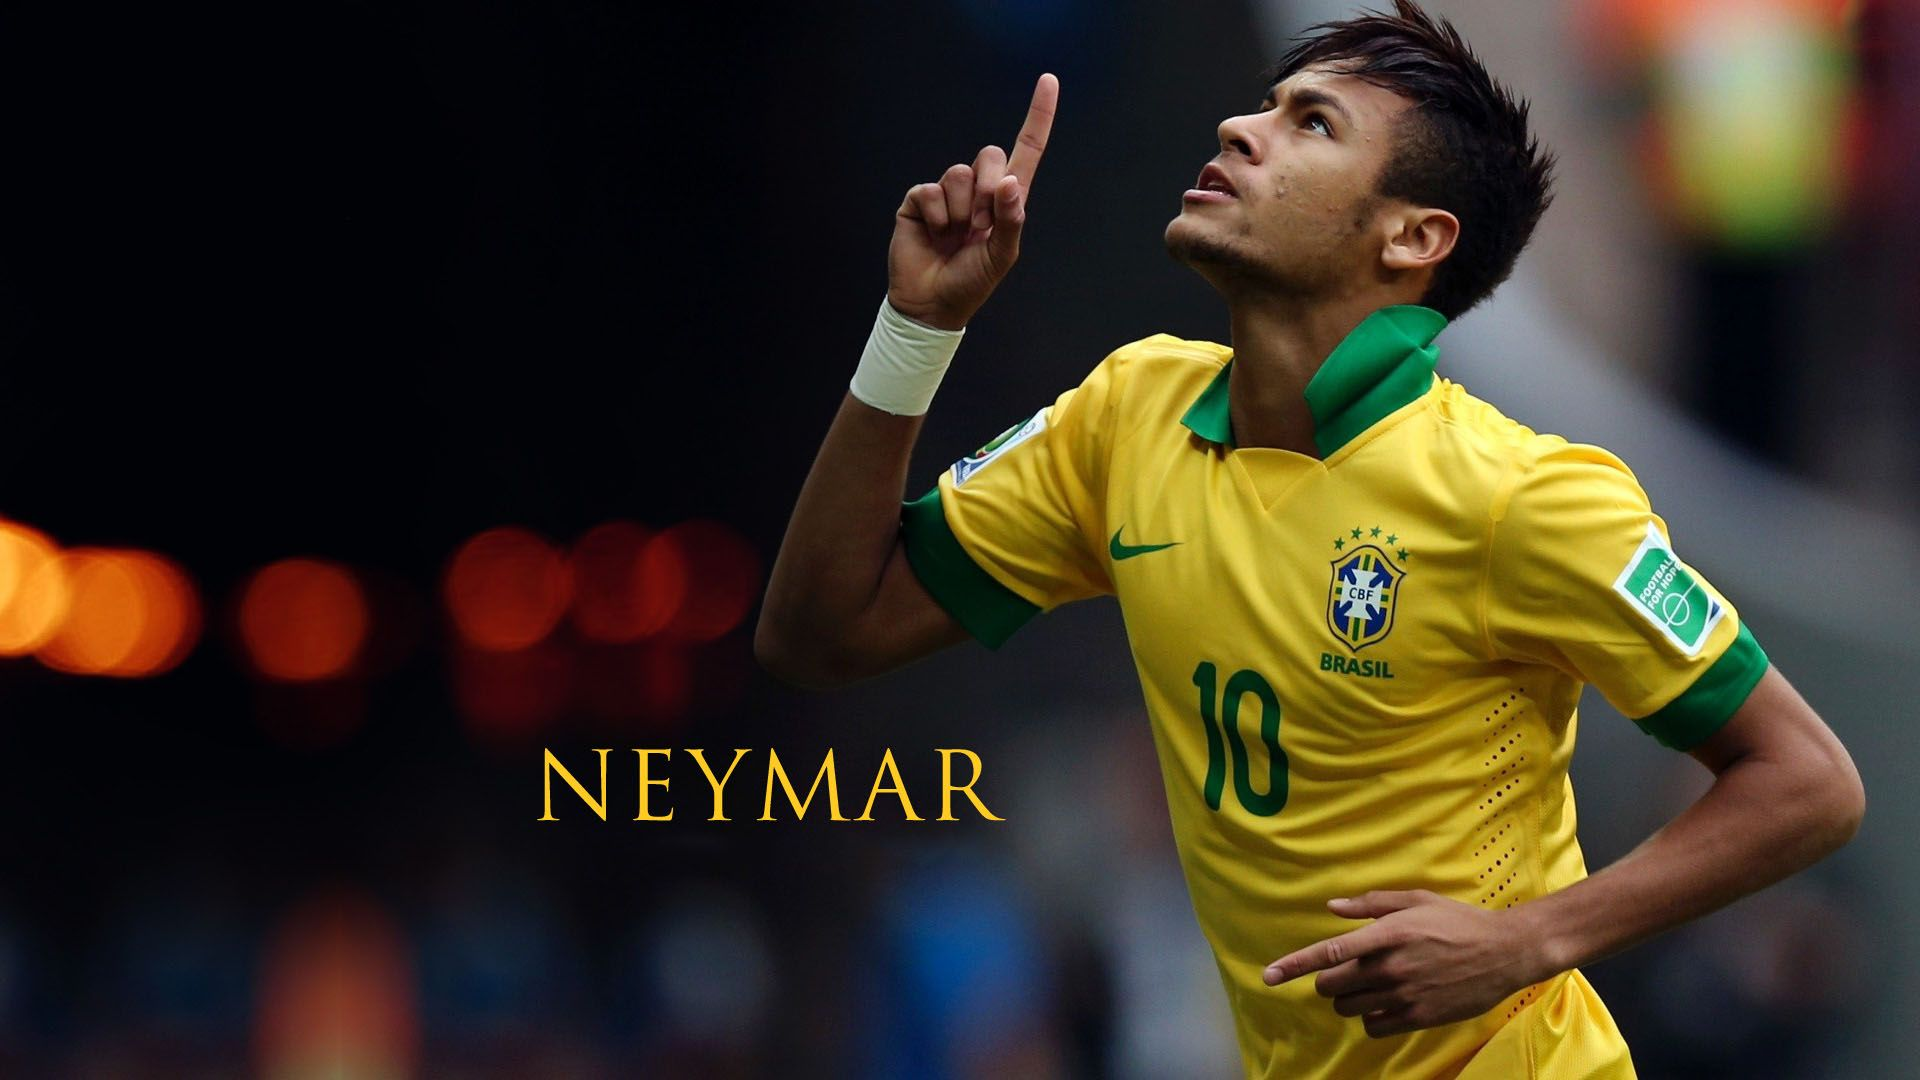 Best Neymar Jr Latest Fifa Images Hd Wallpapers Desktop Pictures